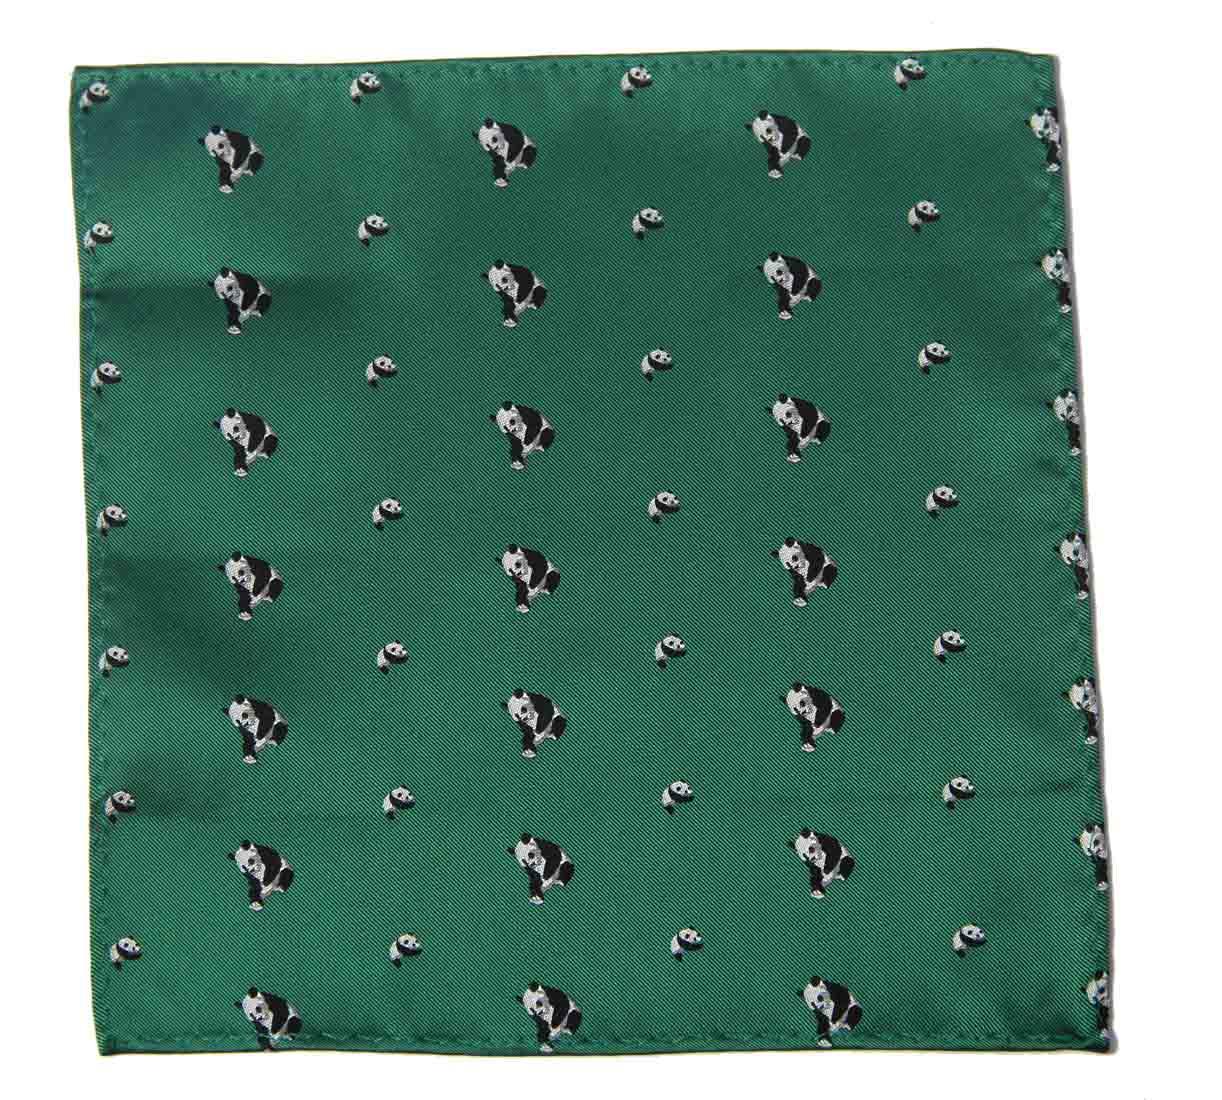 Gascoigne Pocket Square Green Panda Bears Pattern Silk Blend Men's